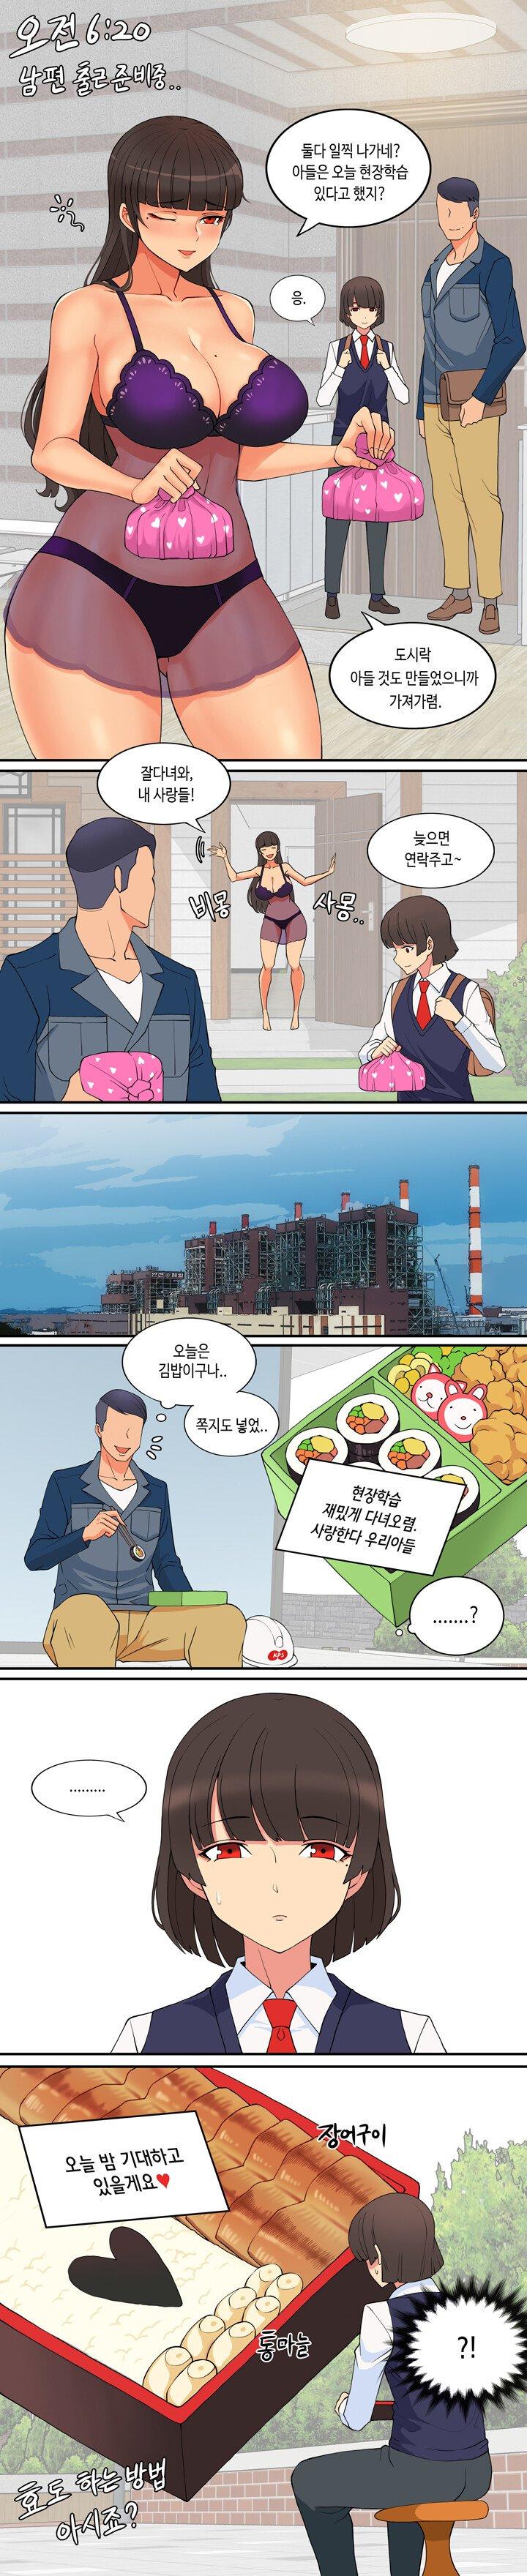 pic_004.jpg ㅇㅎ) 81년생 김복자....JPG